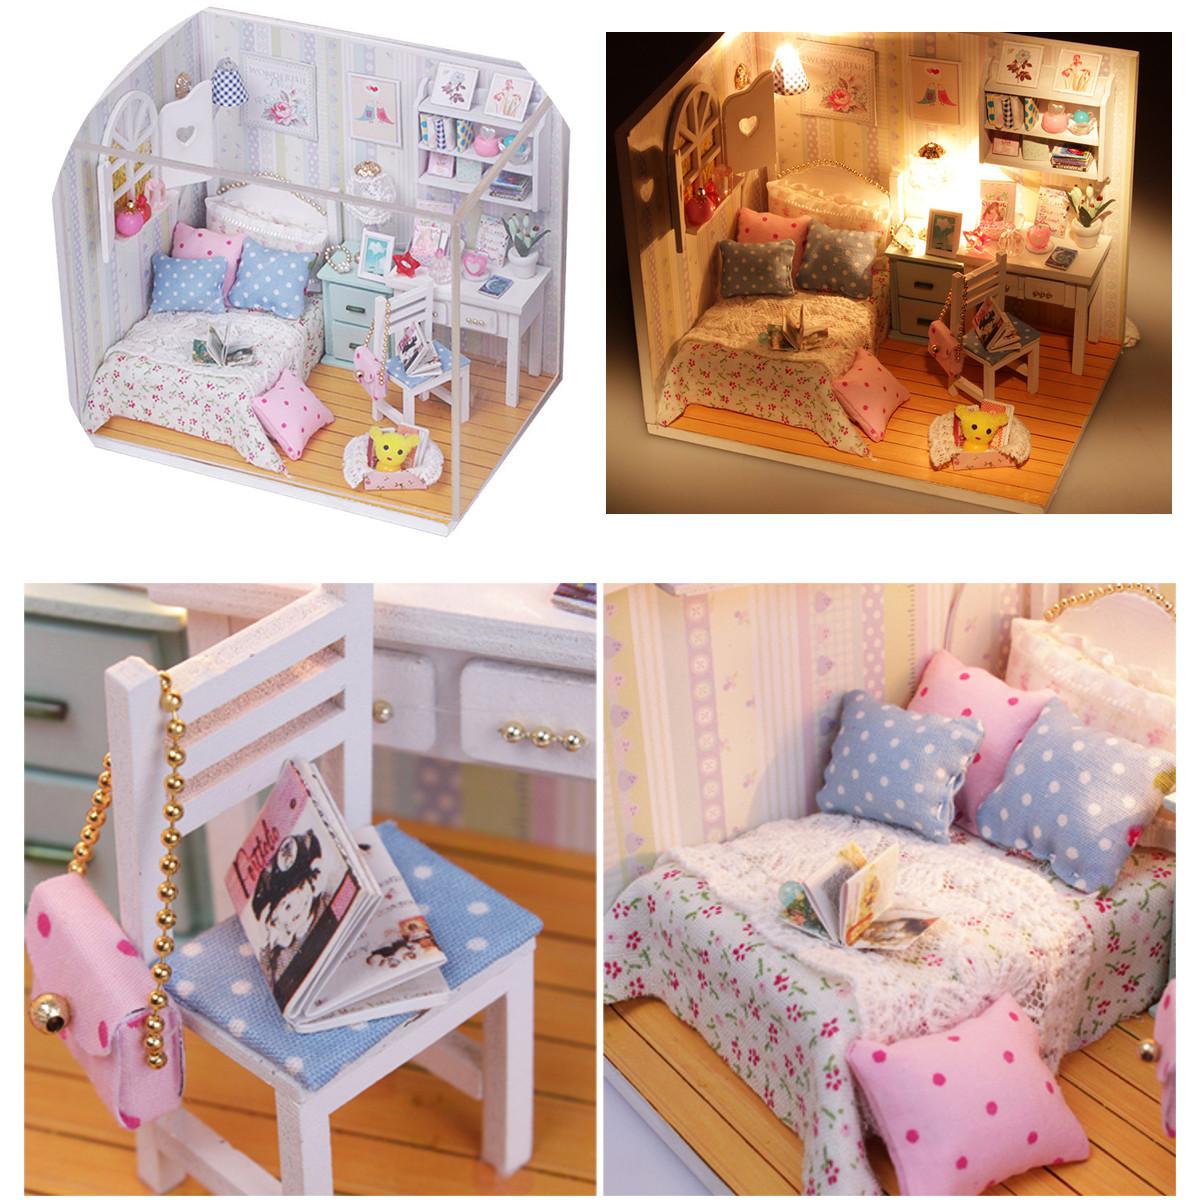 dollhouse miniature furniture. DIY Wood Dollhouse Miniature With LED Furniture Cover Doll House Room